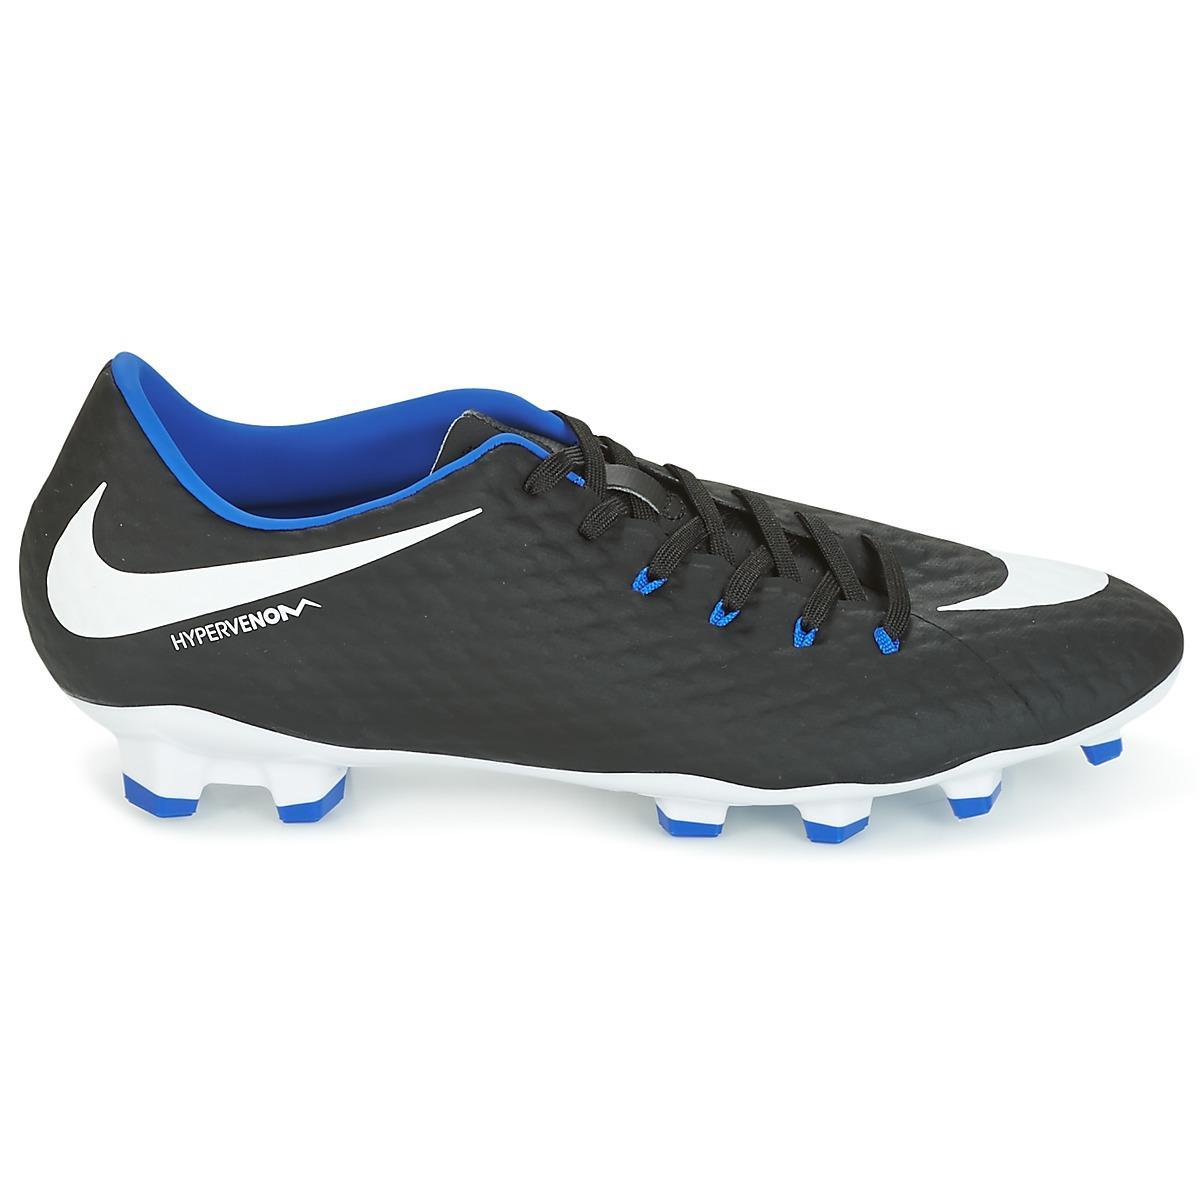 a19a6ae07a3 Nike - Black Hypervenom Phelon Iii Fg Football Boots for Men - Lyst. View  fullscreen